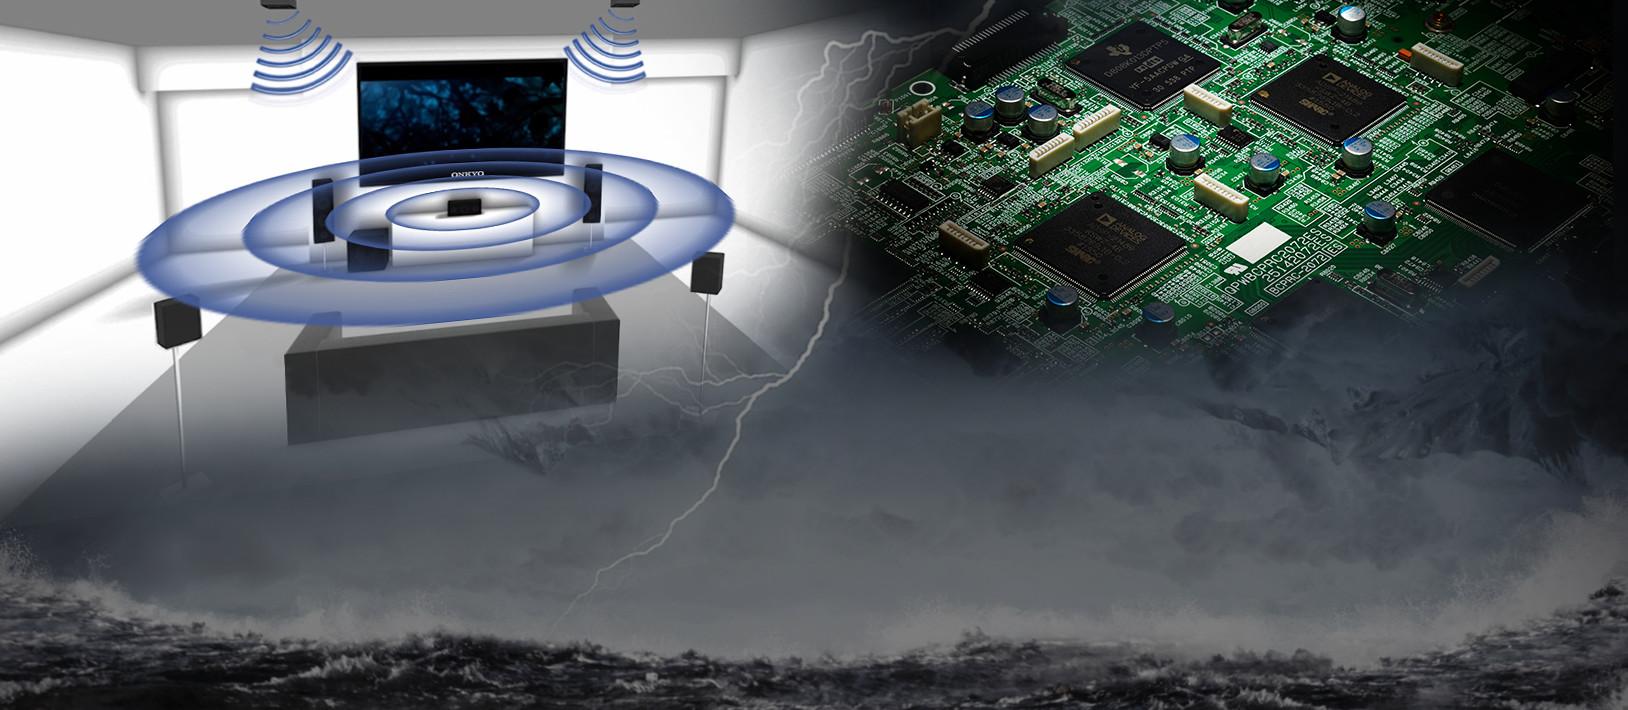 qq影音播放器官网_安桥TX-RZ1100 9.2 声道网络影音接收机 - 卡拉OK发烧音响设备-家庭 ...